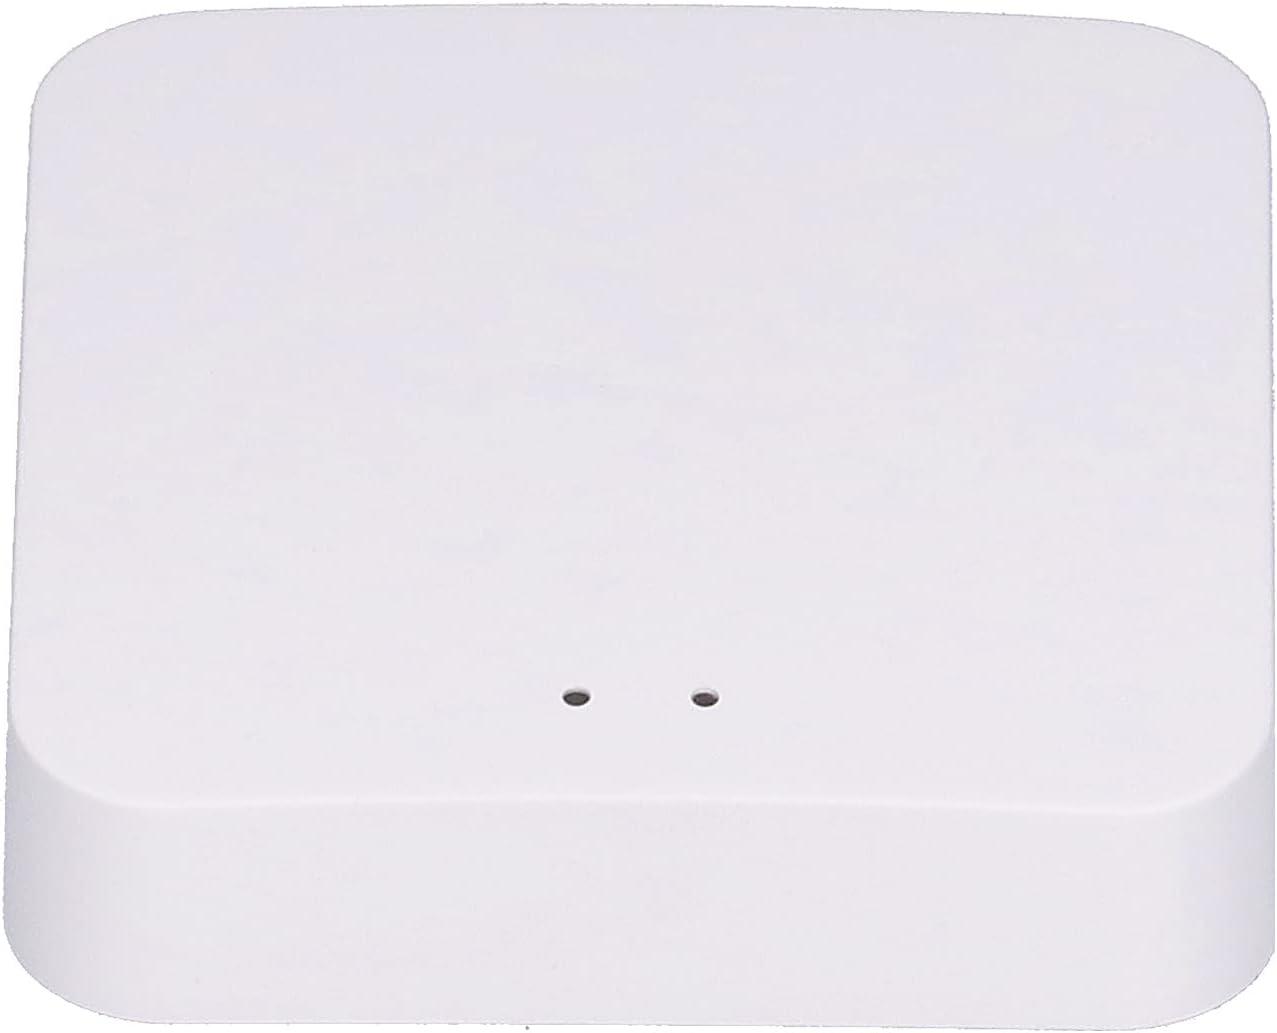 BOTEGRA Smart Home, Anti-Slip Design Easy to Use Wireless for Office for Family Living Room